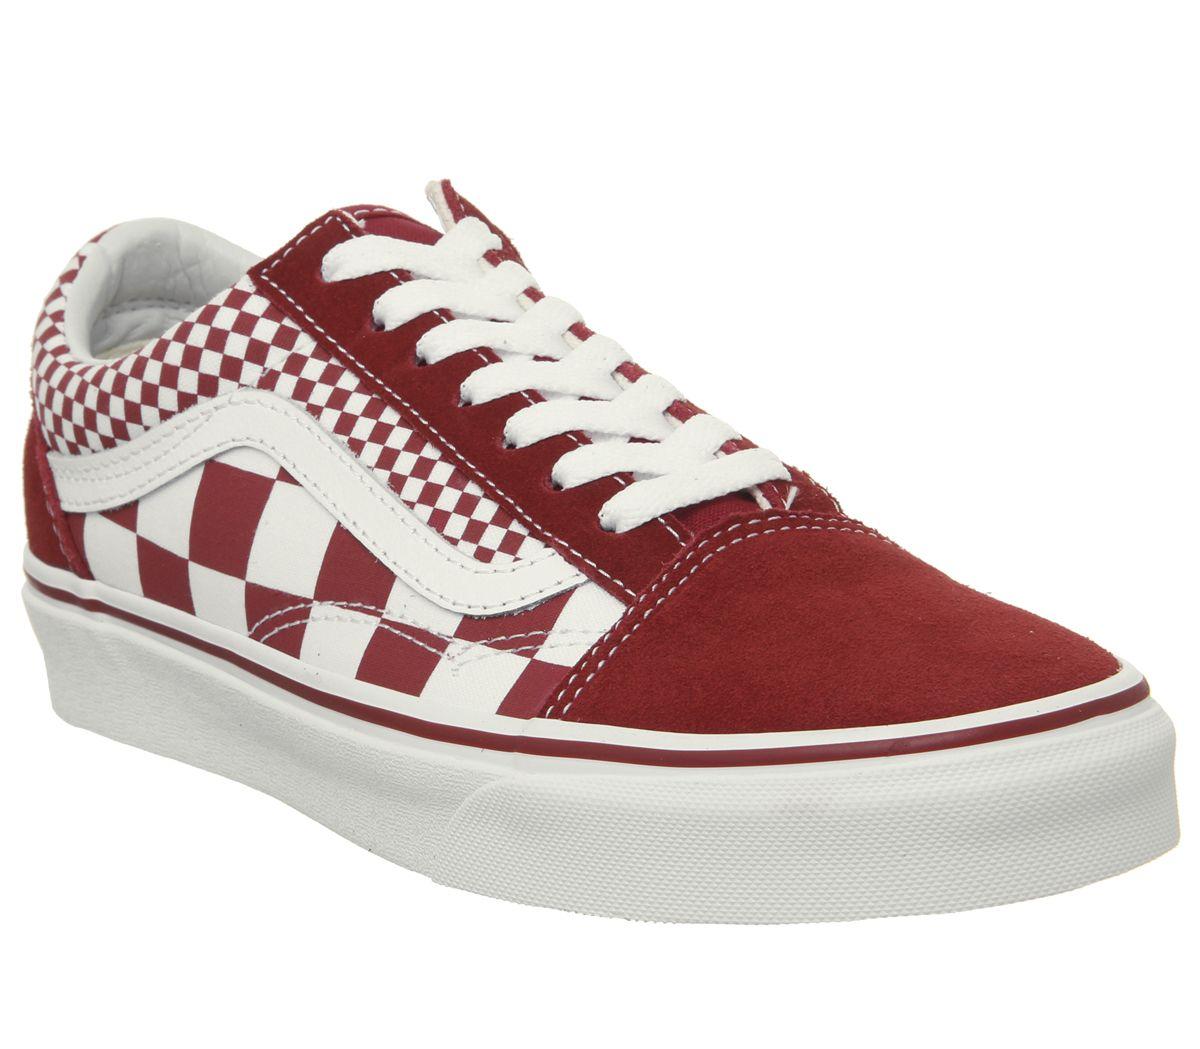 c472937bb7 Vans Old Skool Trainers Chilli Pepper Mix Check True White - Unisex ...